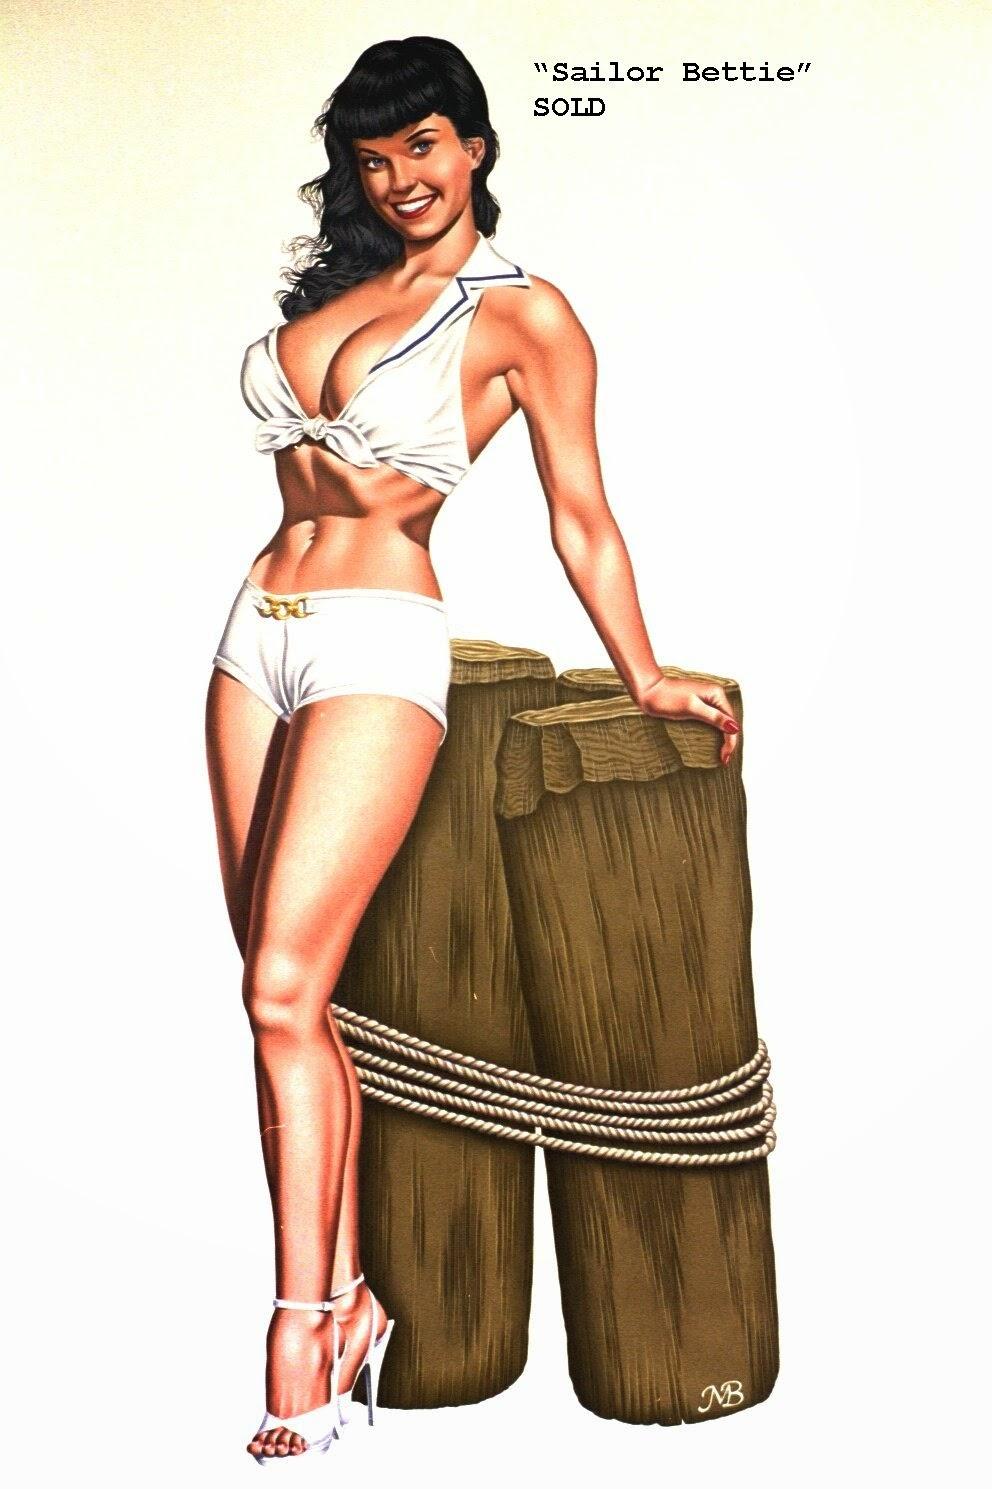 Retro Pin Up, Nude with a Apron Prints - Freeman Elliott